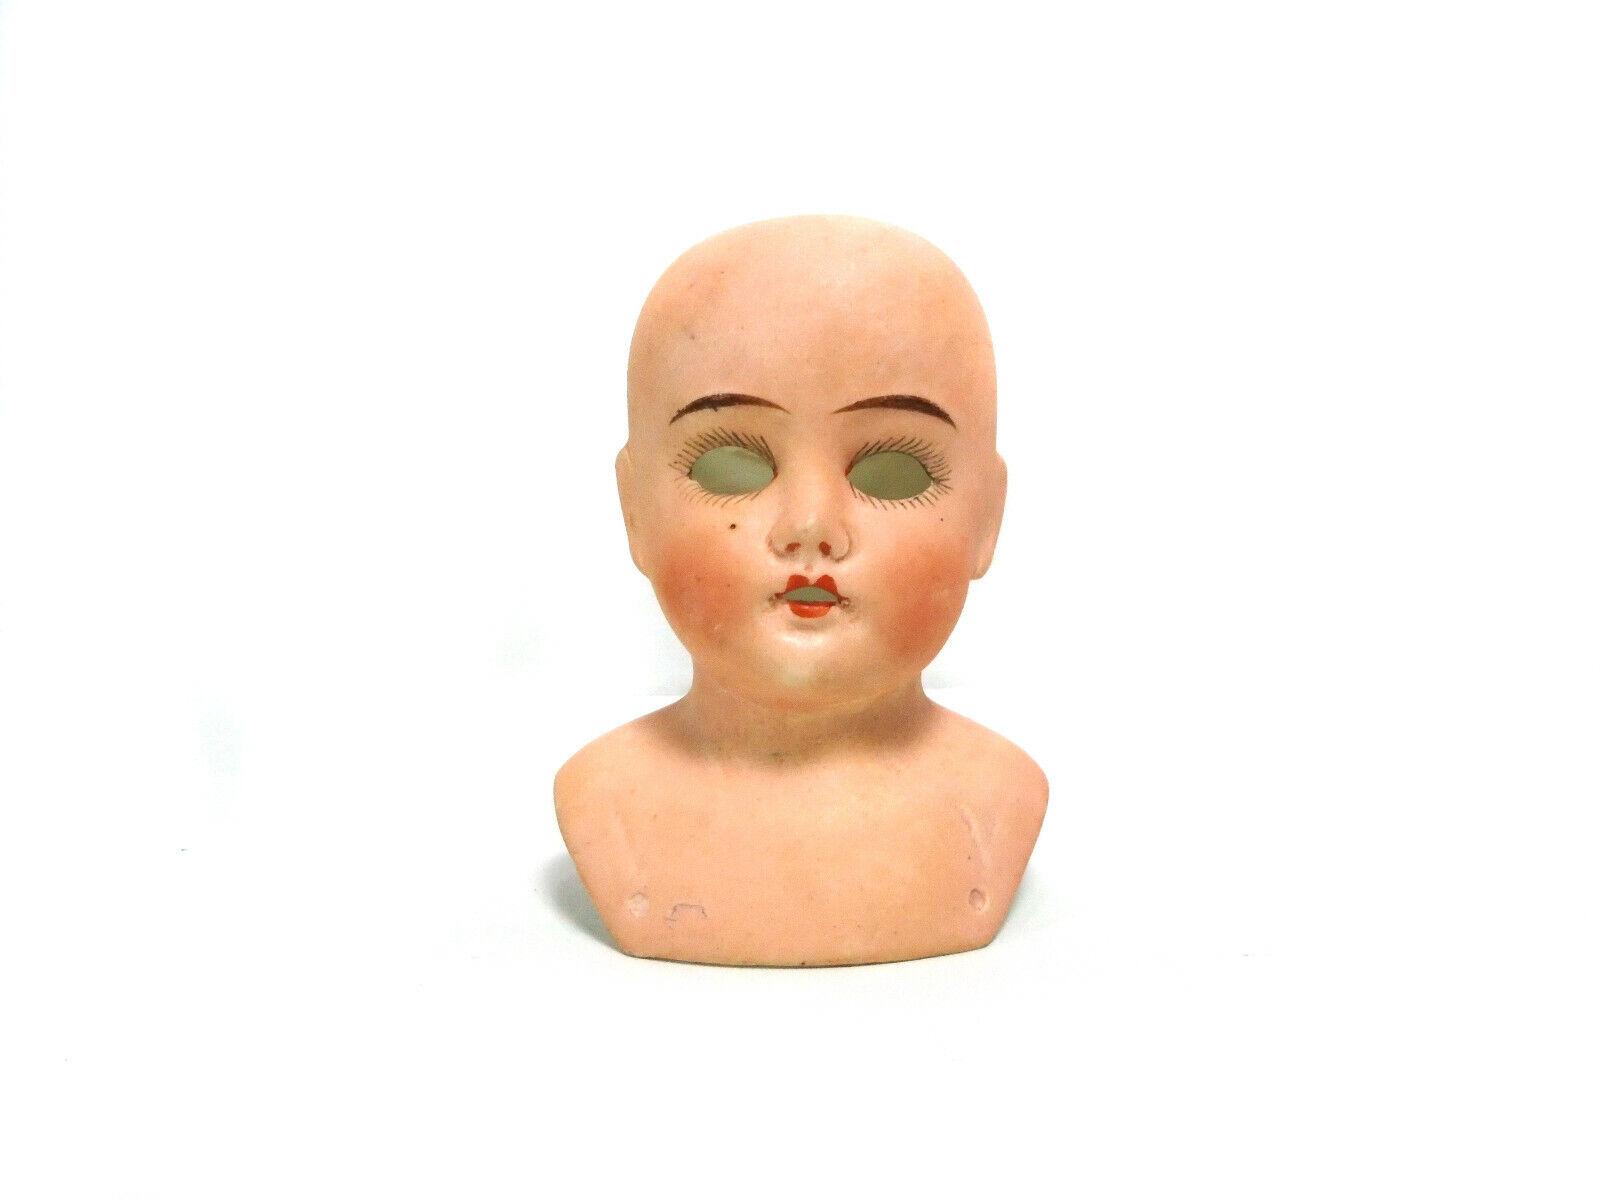 Antique bisque porcelain doll head, Ernst Heubach, shoulderplate